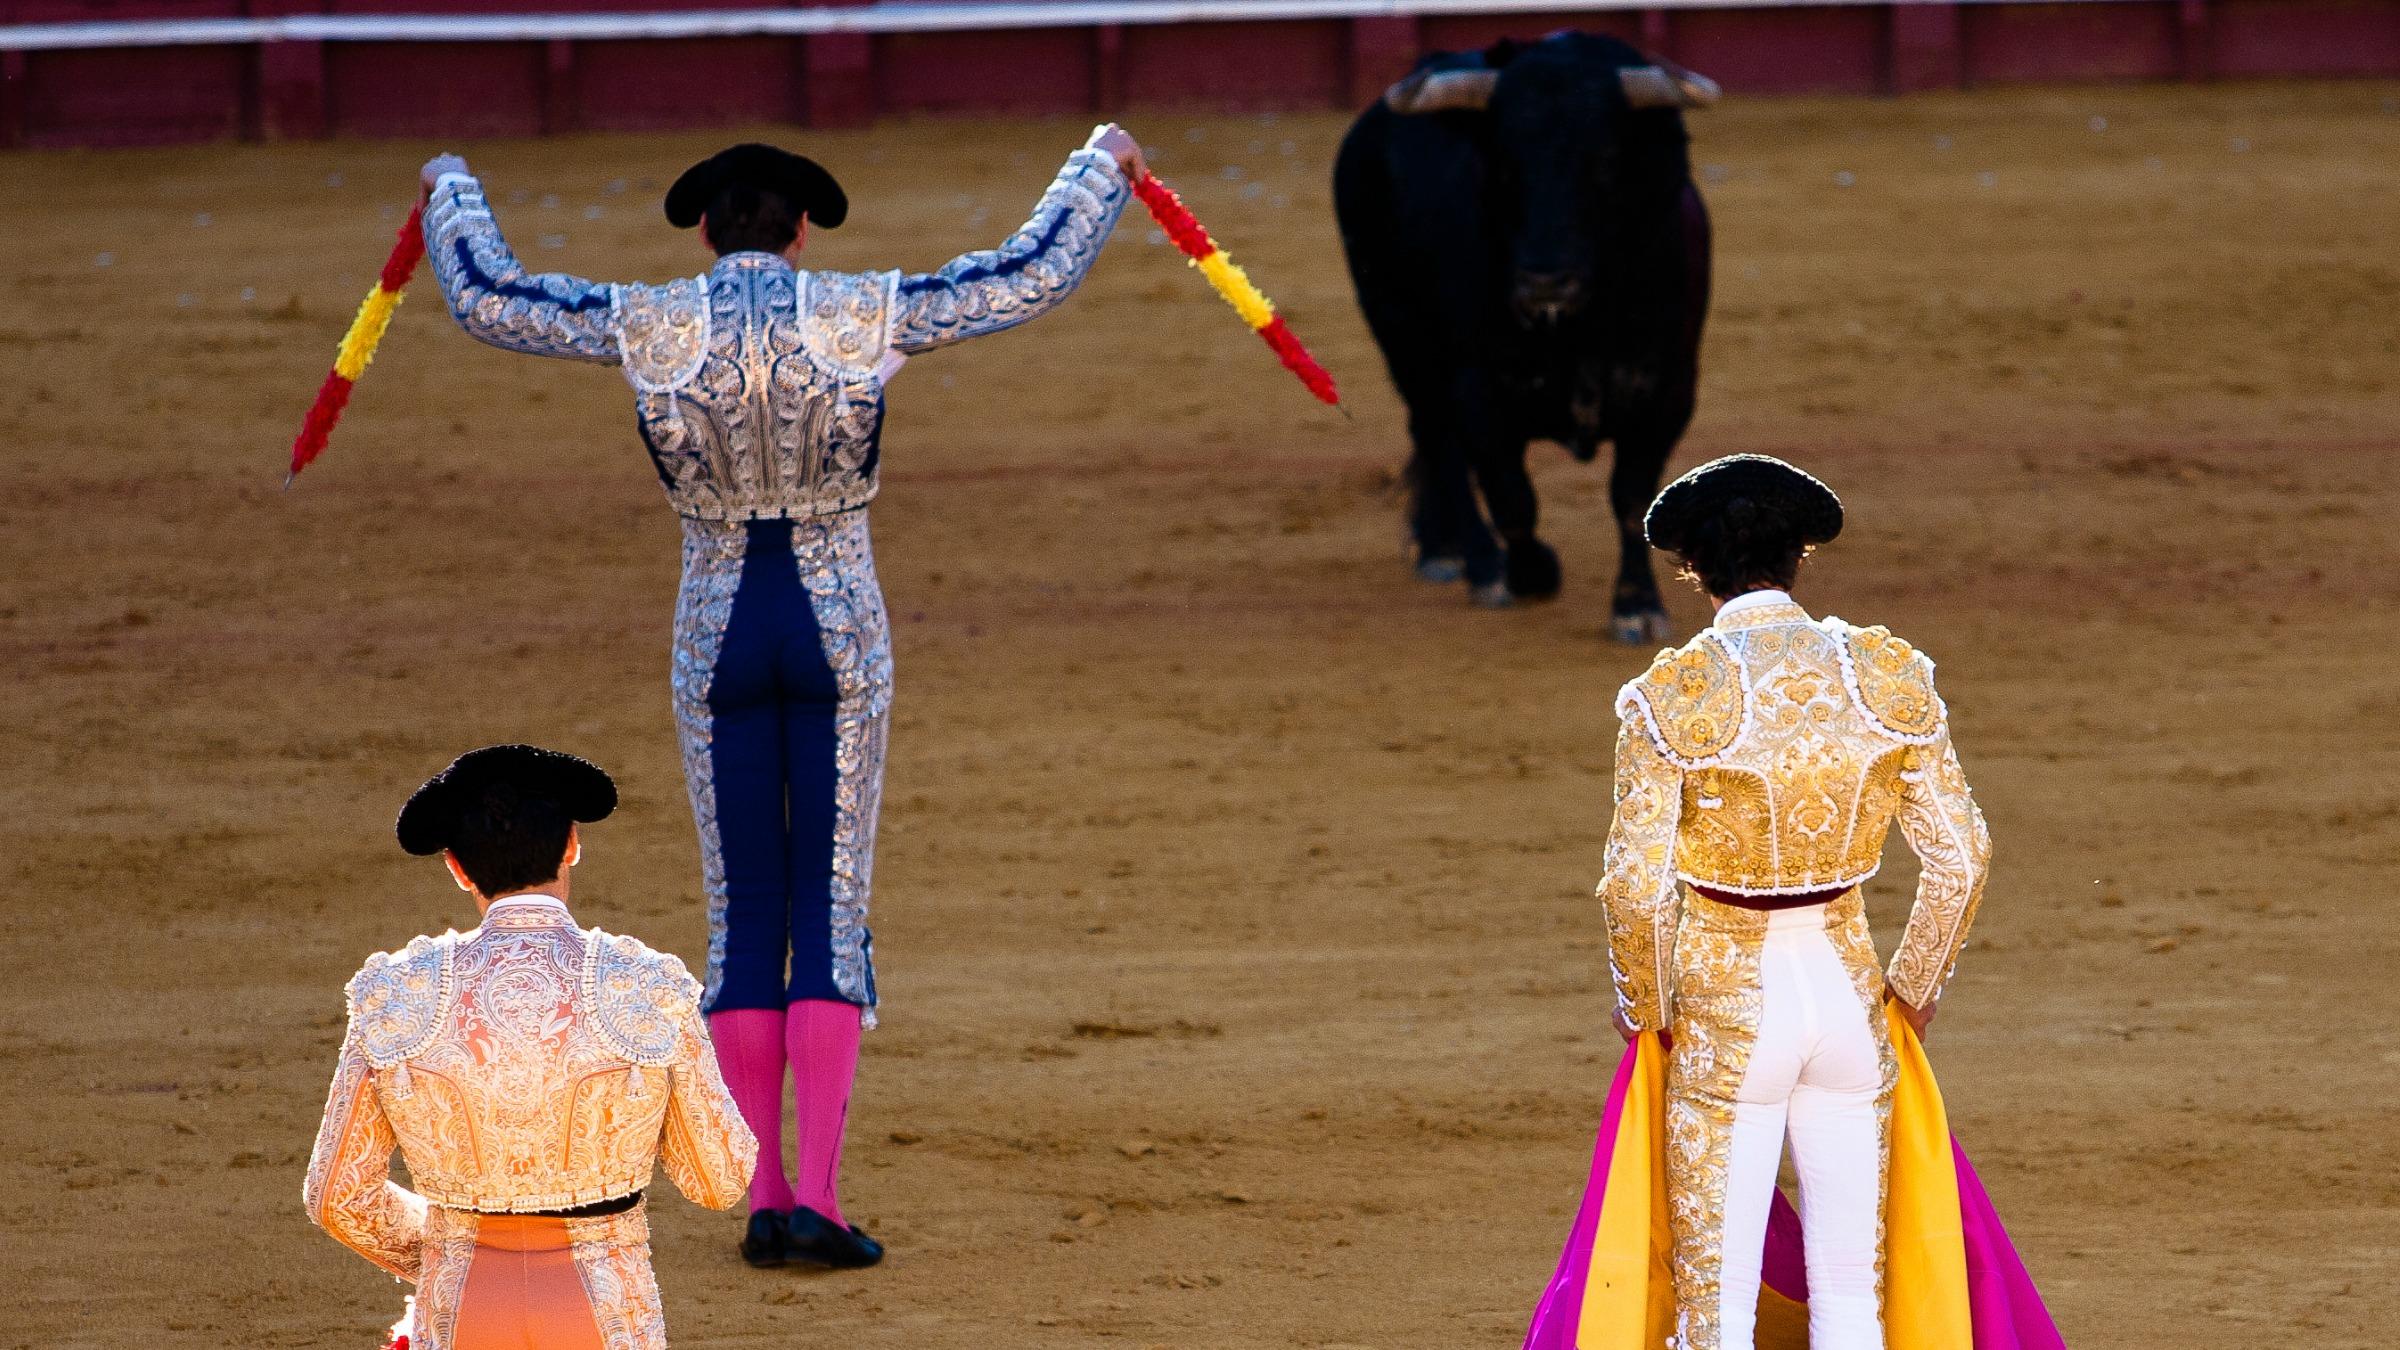 Arbour - bullfighting